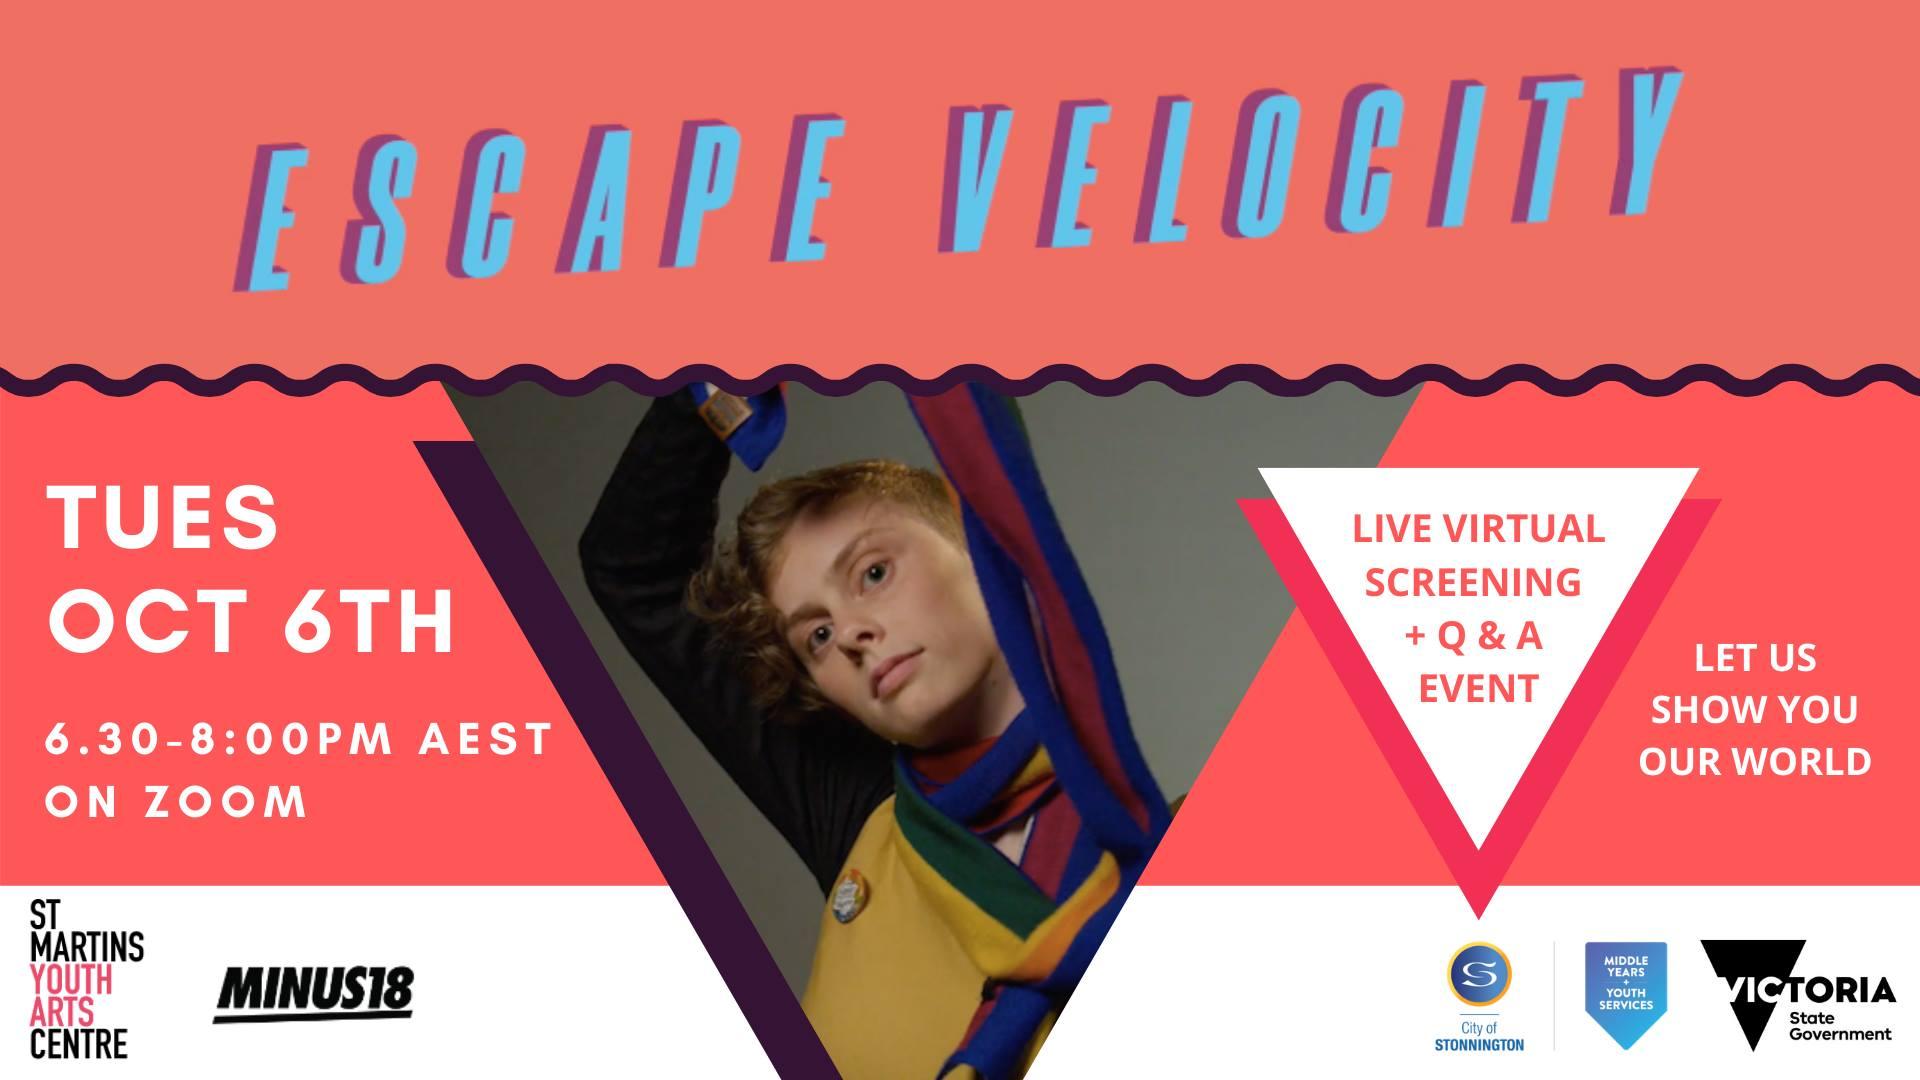 ESCAPE VELOCITY - Film Screening & Live Q&A [Online]